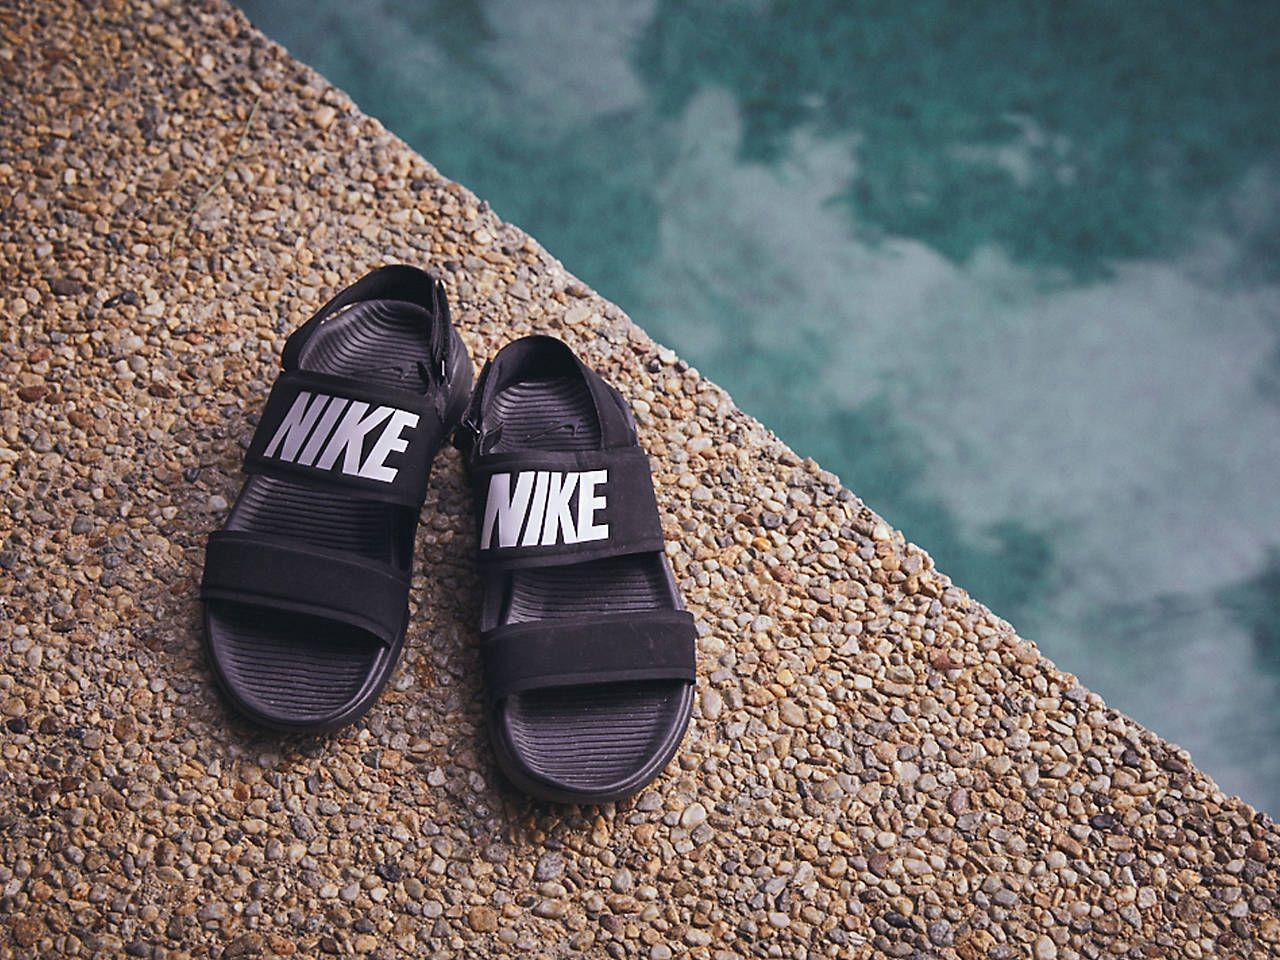 Nike Tanjun Sandal in 2020 | Hype shoes